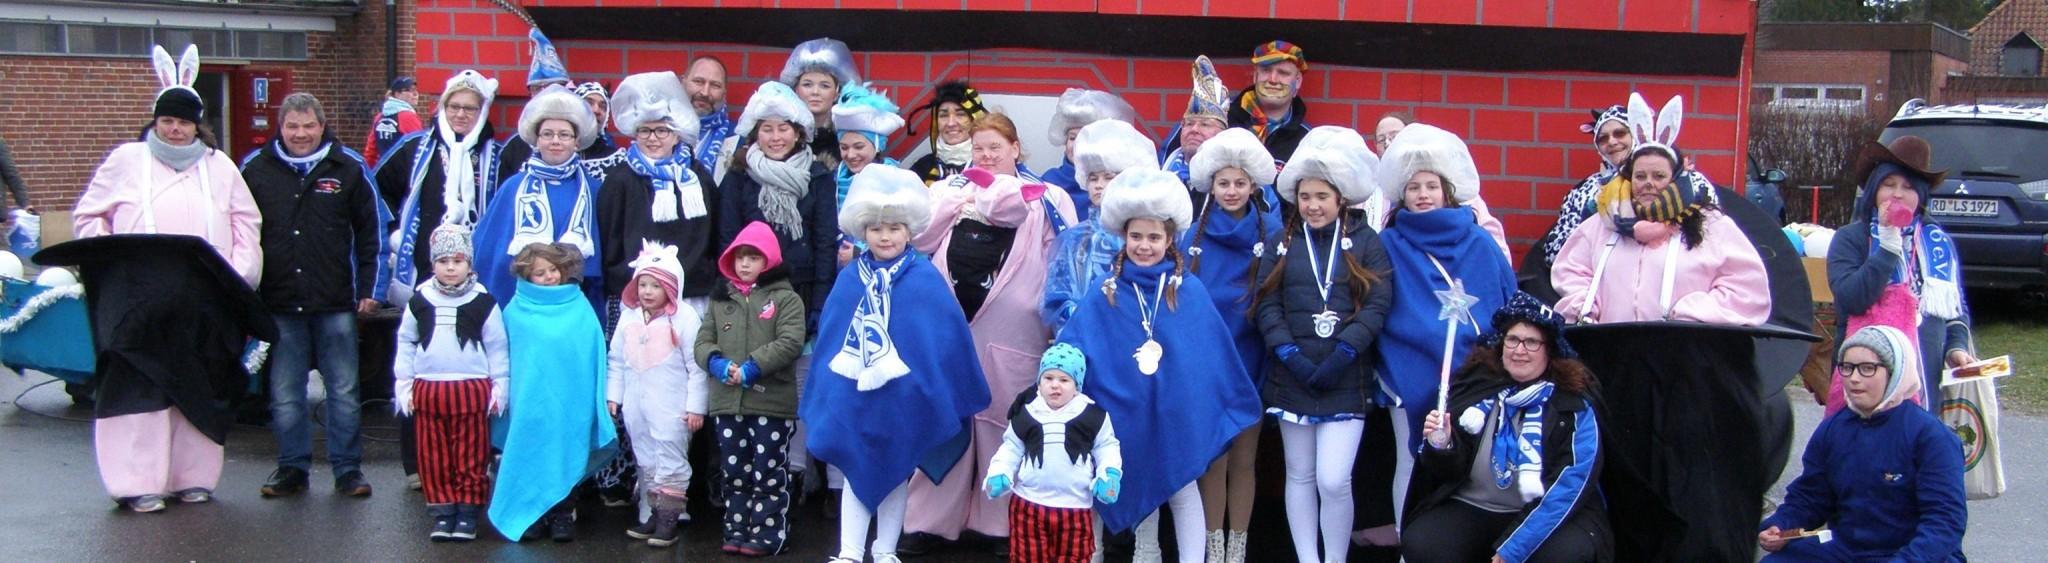 Carneval-Club Rendsburg e.V.